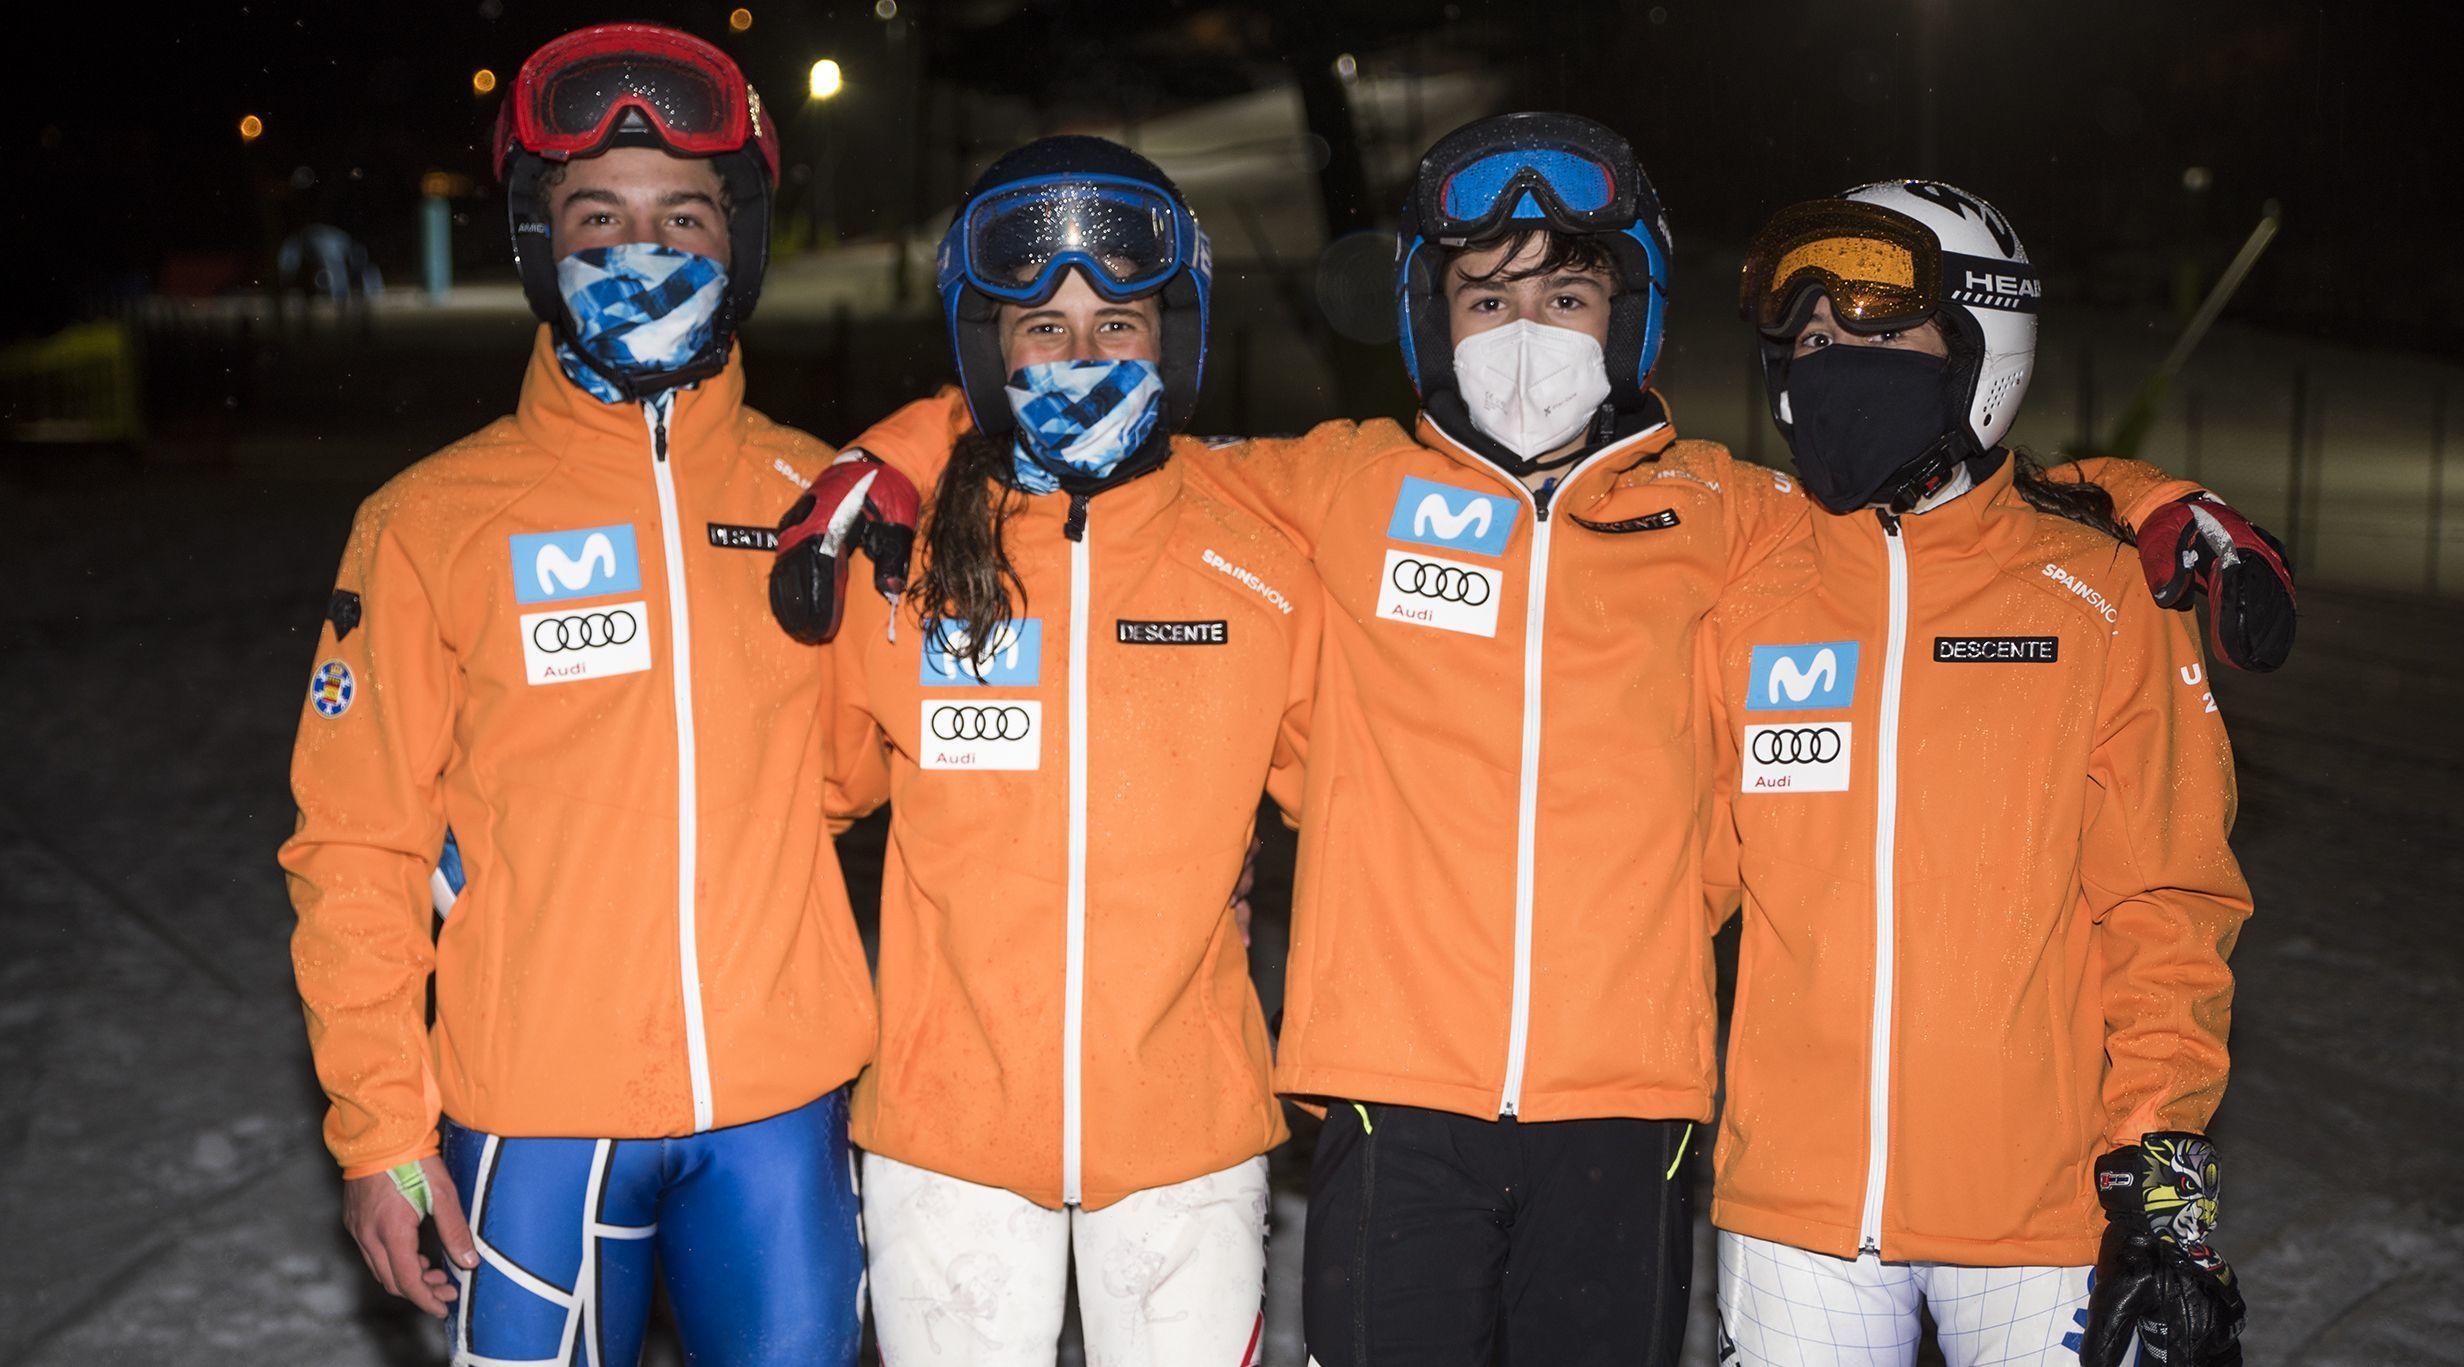 El equipo español gana el National Team Event del Trofeo Borrufa 2021